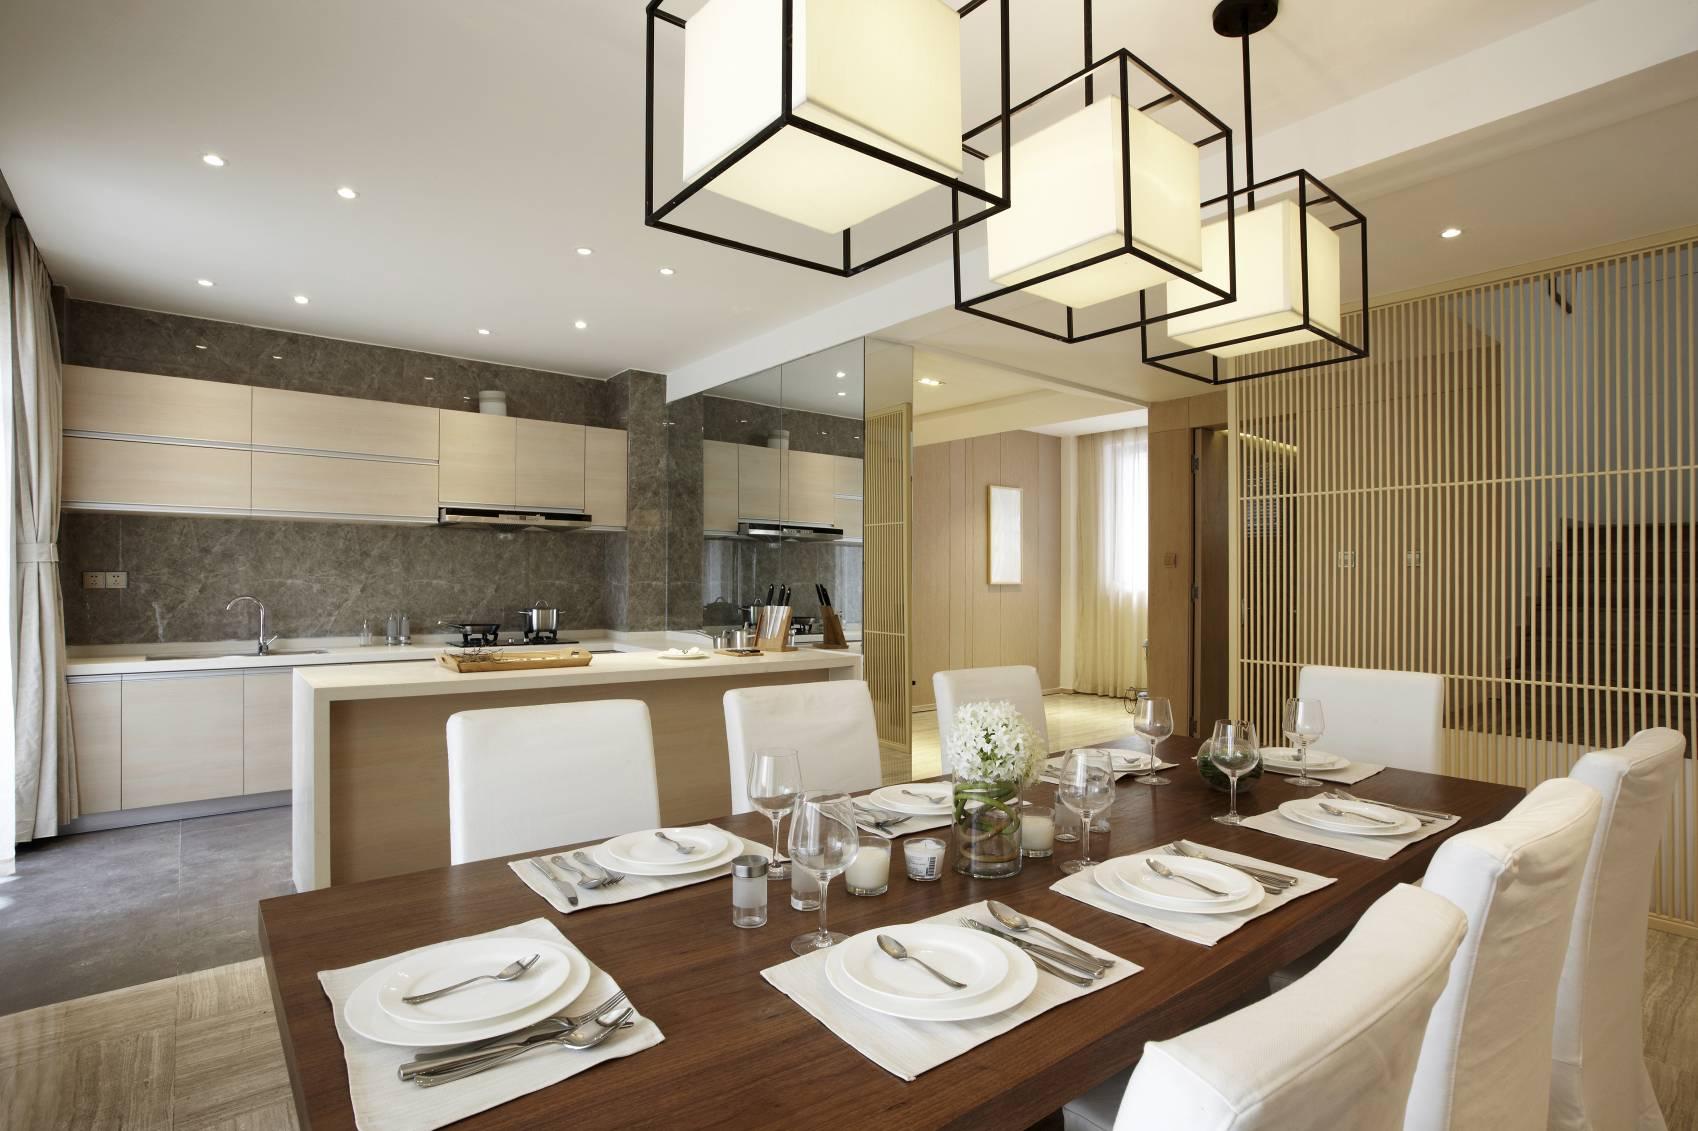 Choisir une table de salle manger for Salle a manger design 2015